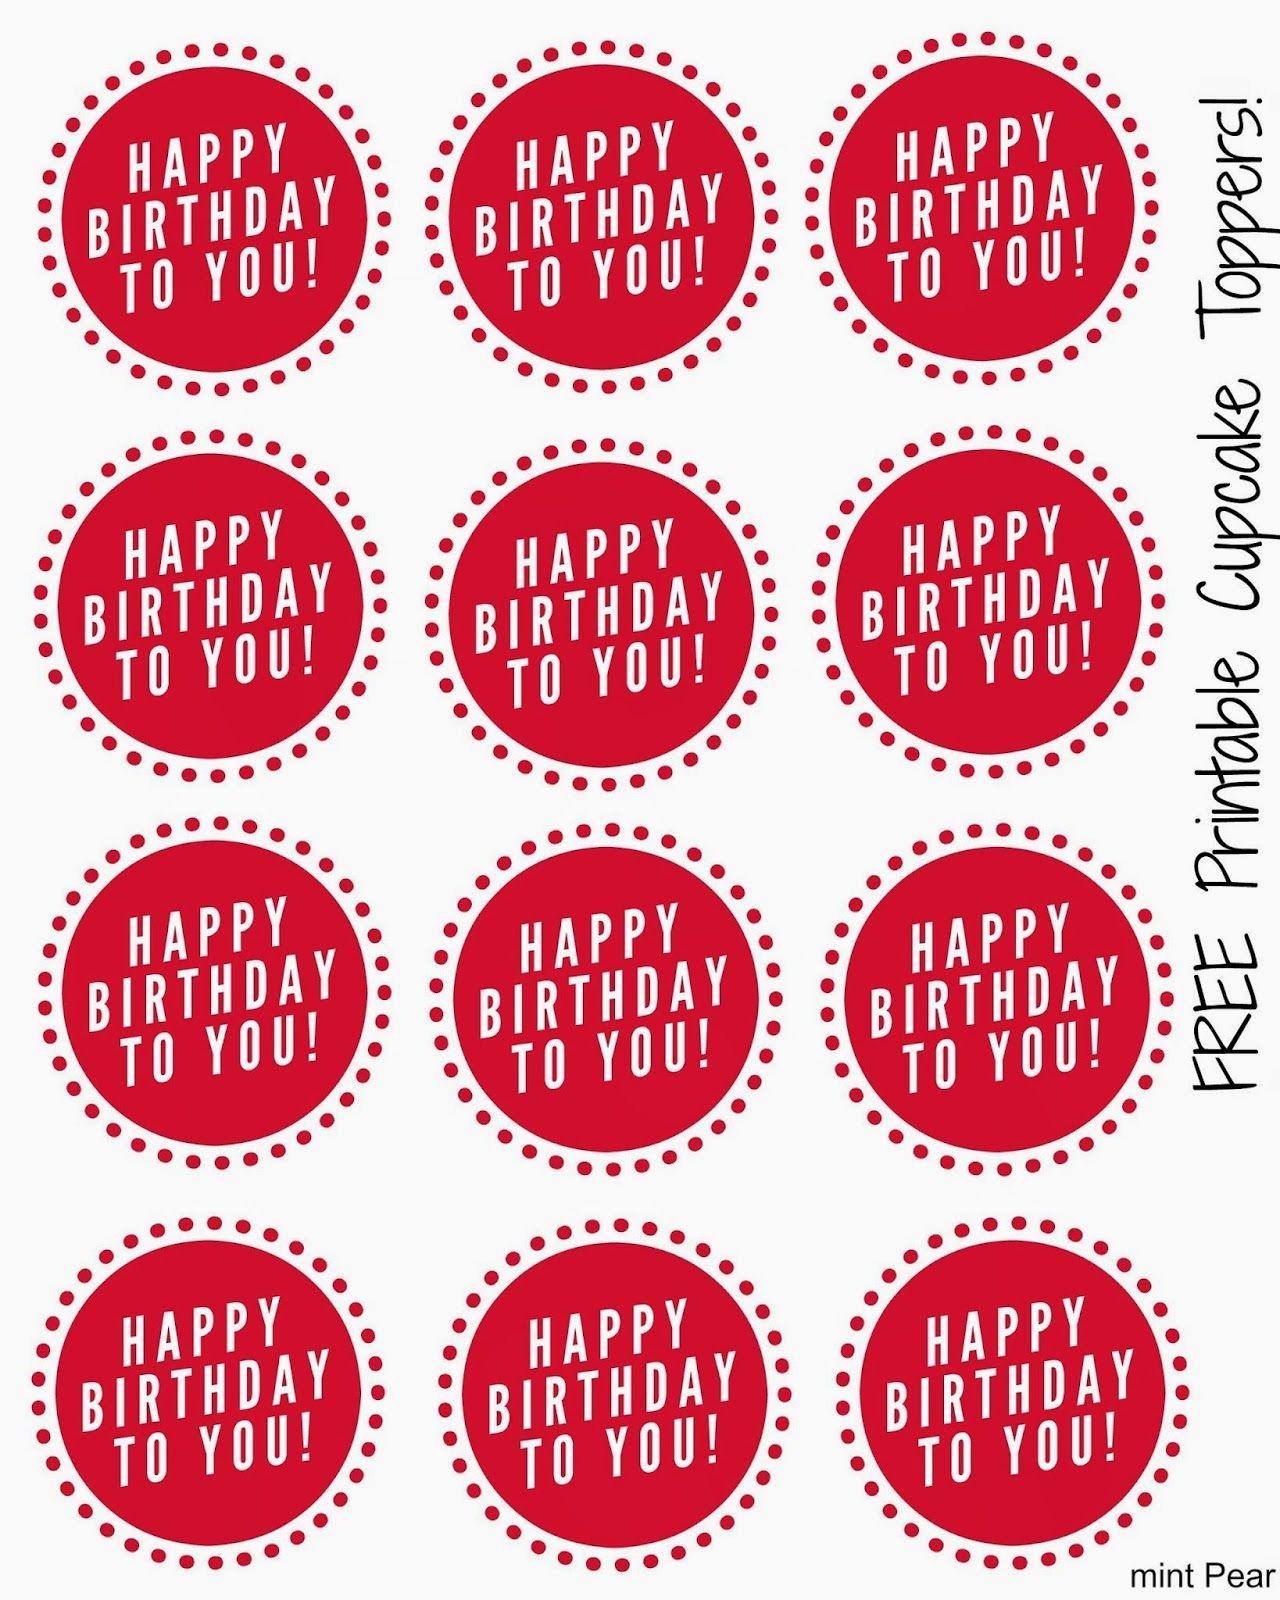 Free Printable Cupcake Toppers | Free Stuff! | Cupcake Toppers Free - Free Printable Train Cupcake Toppers